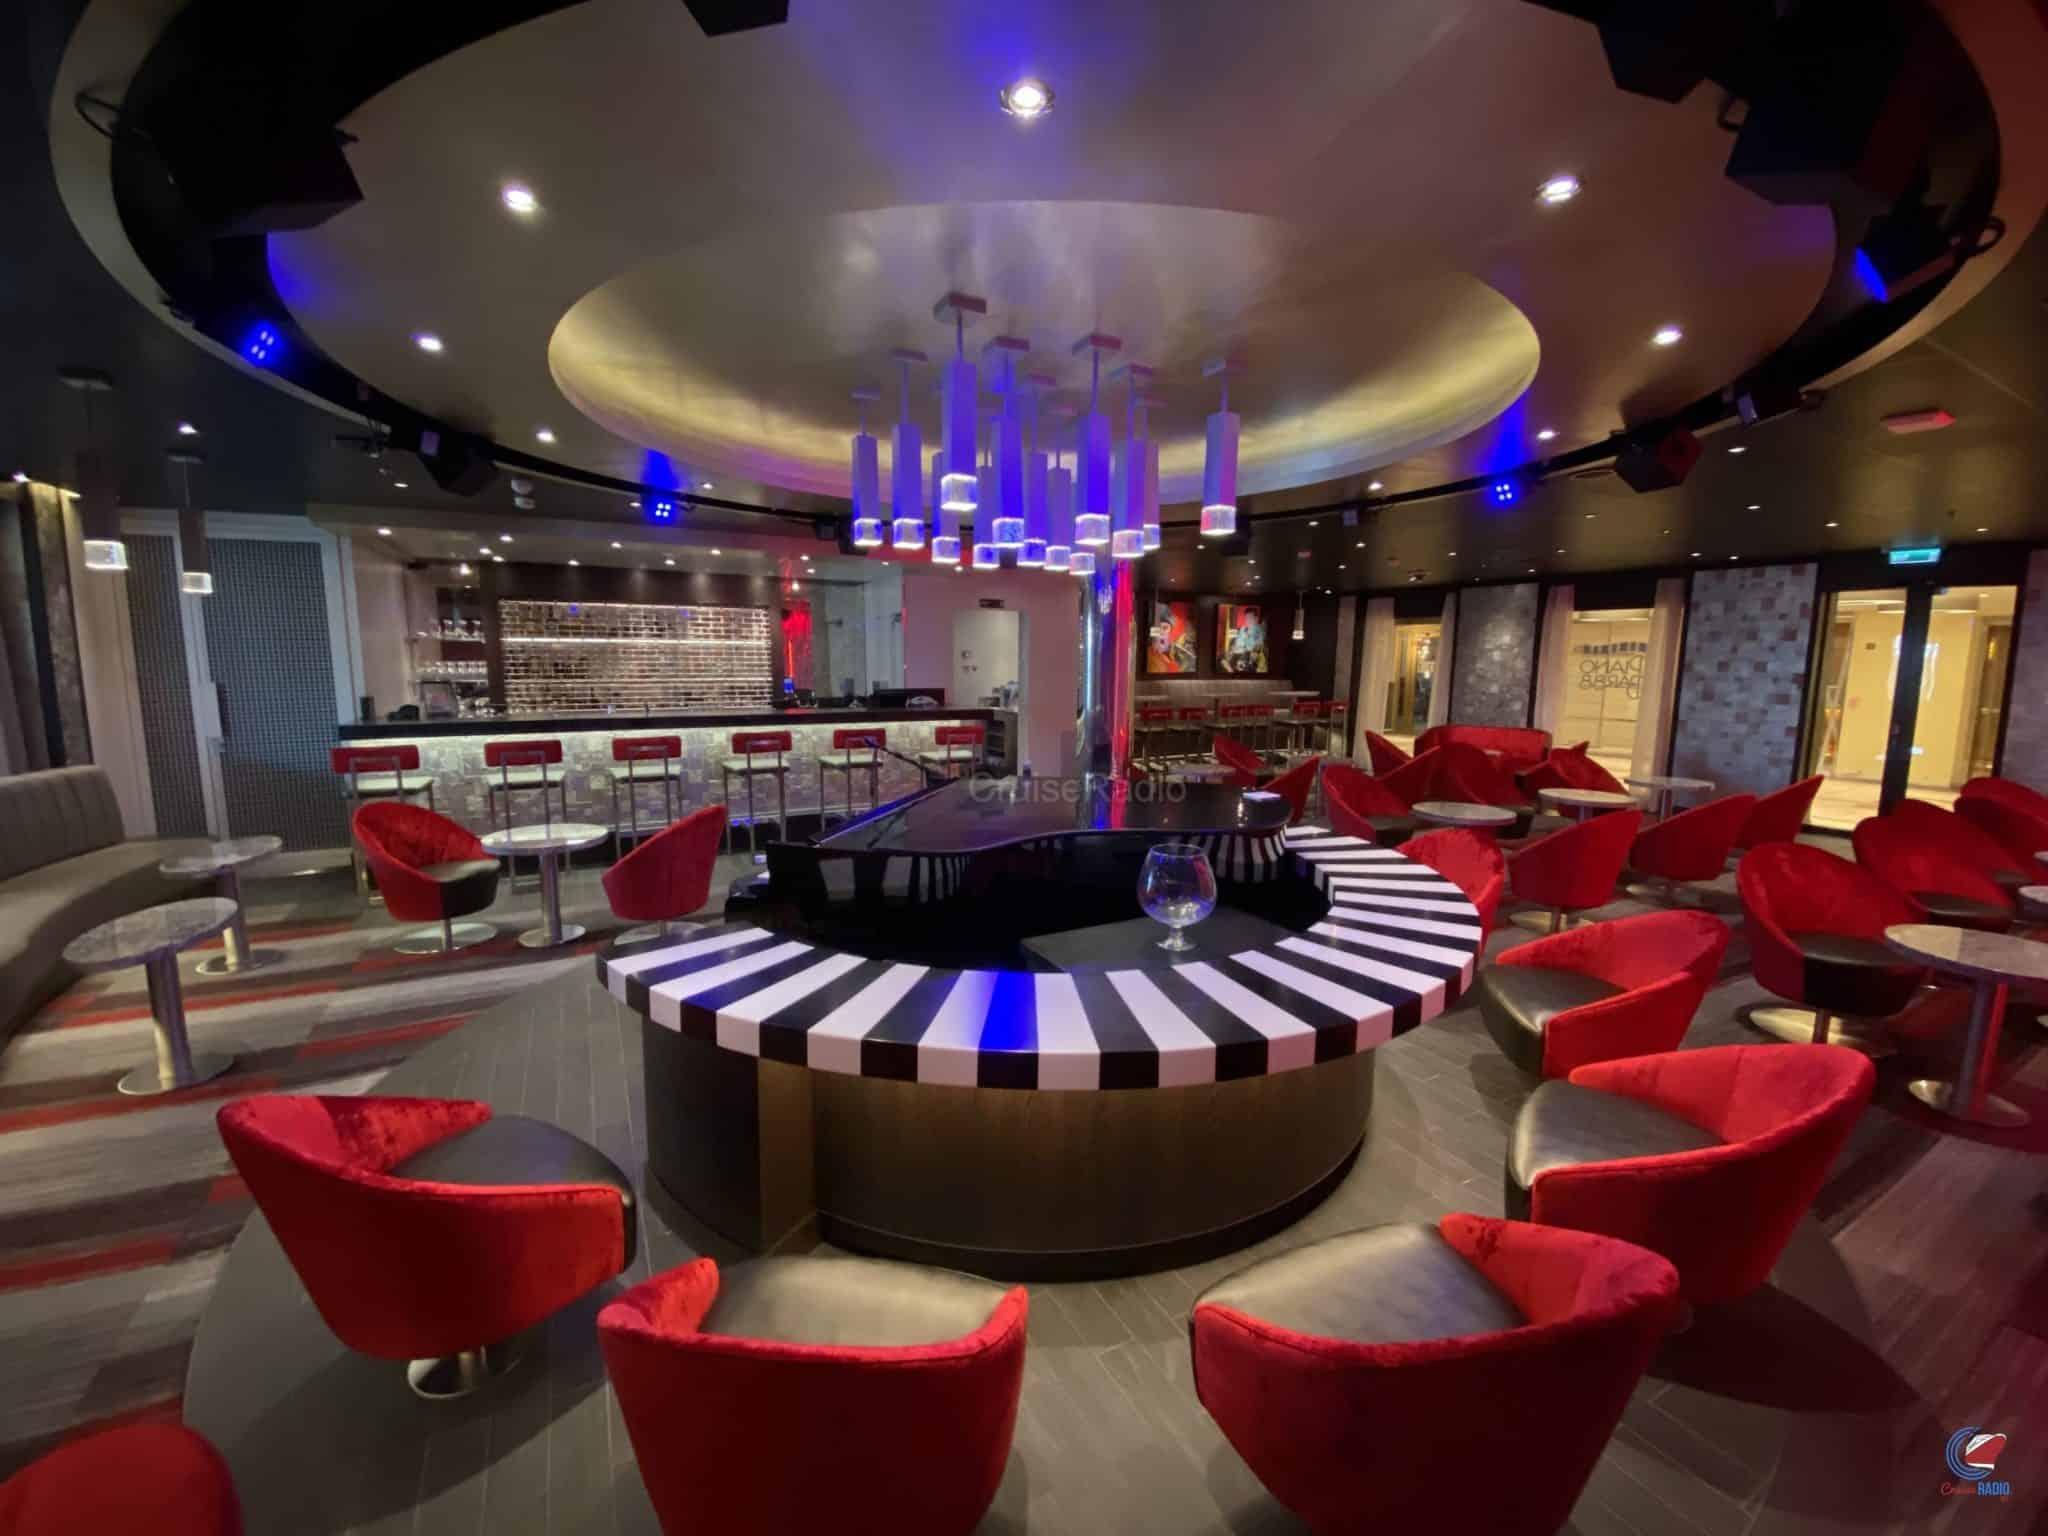 Carnival Panorama piano bar